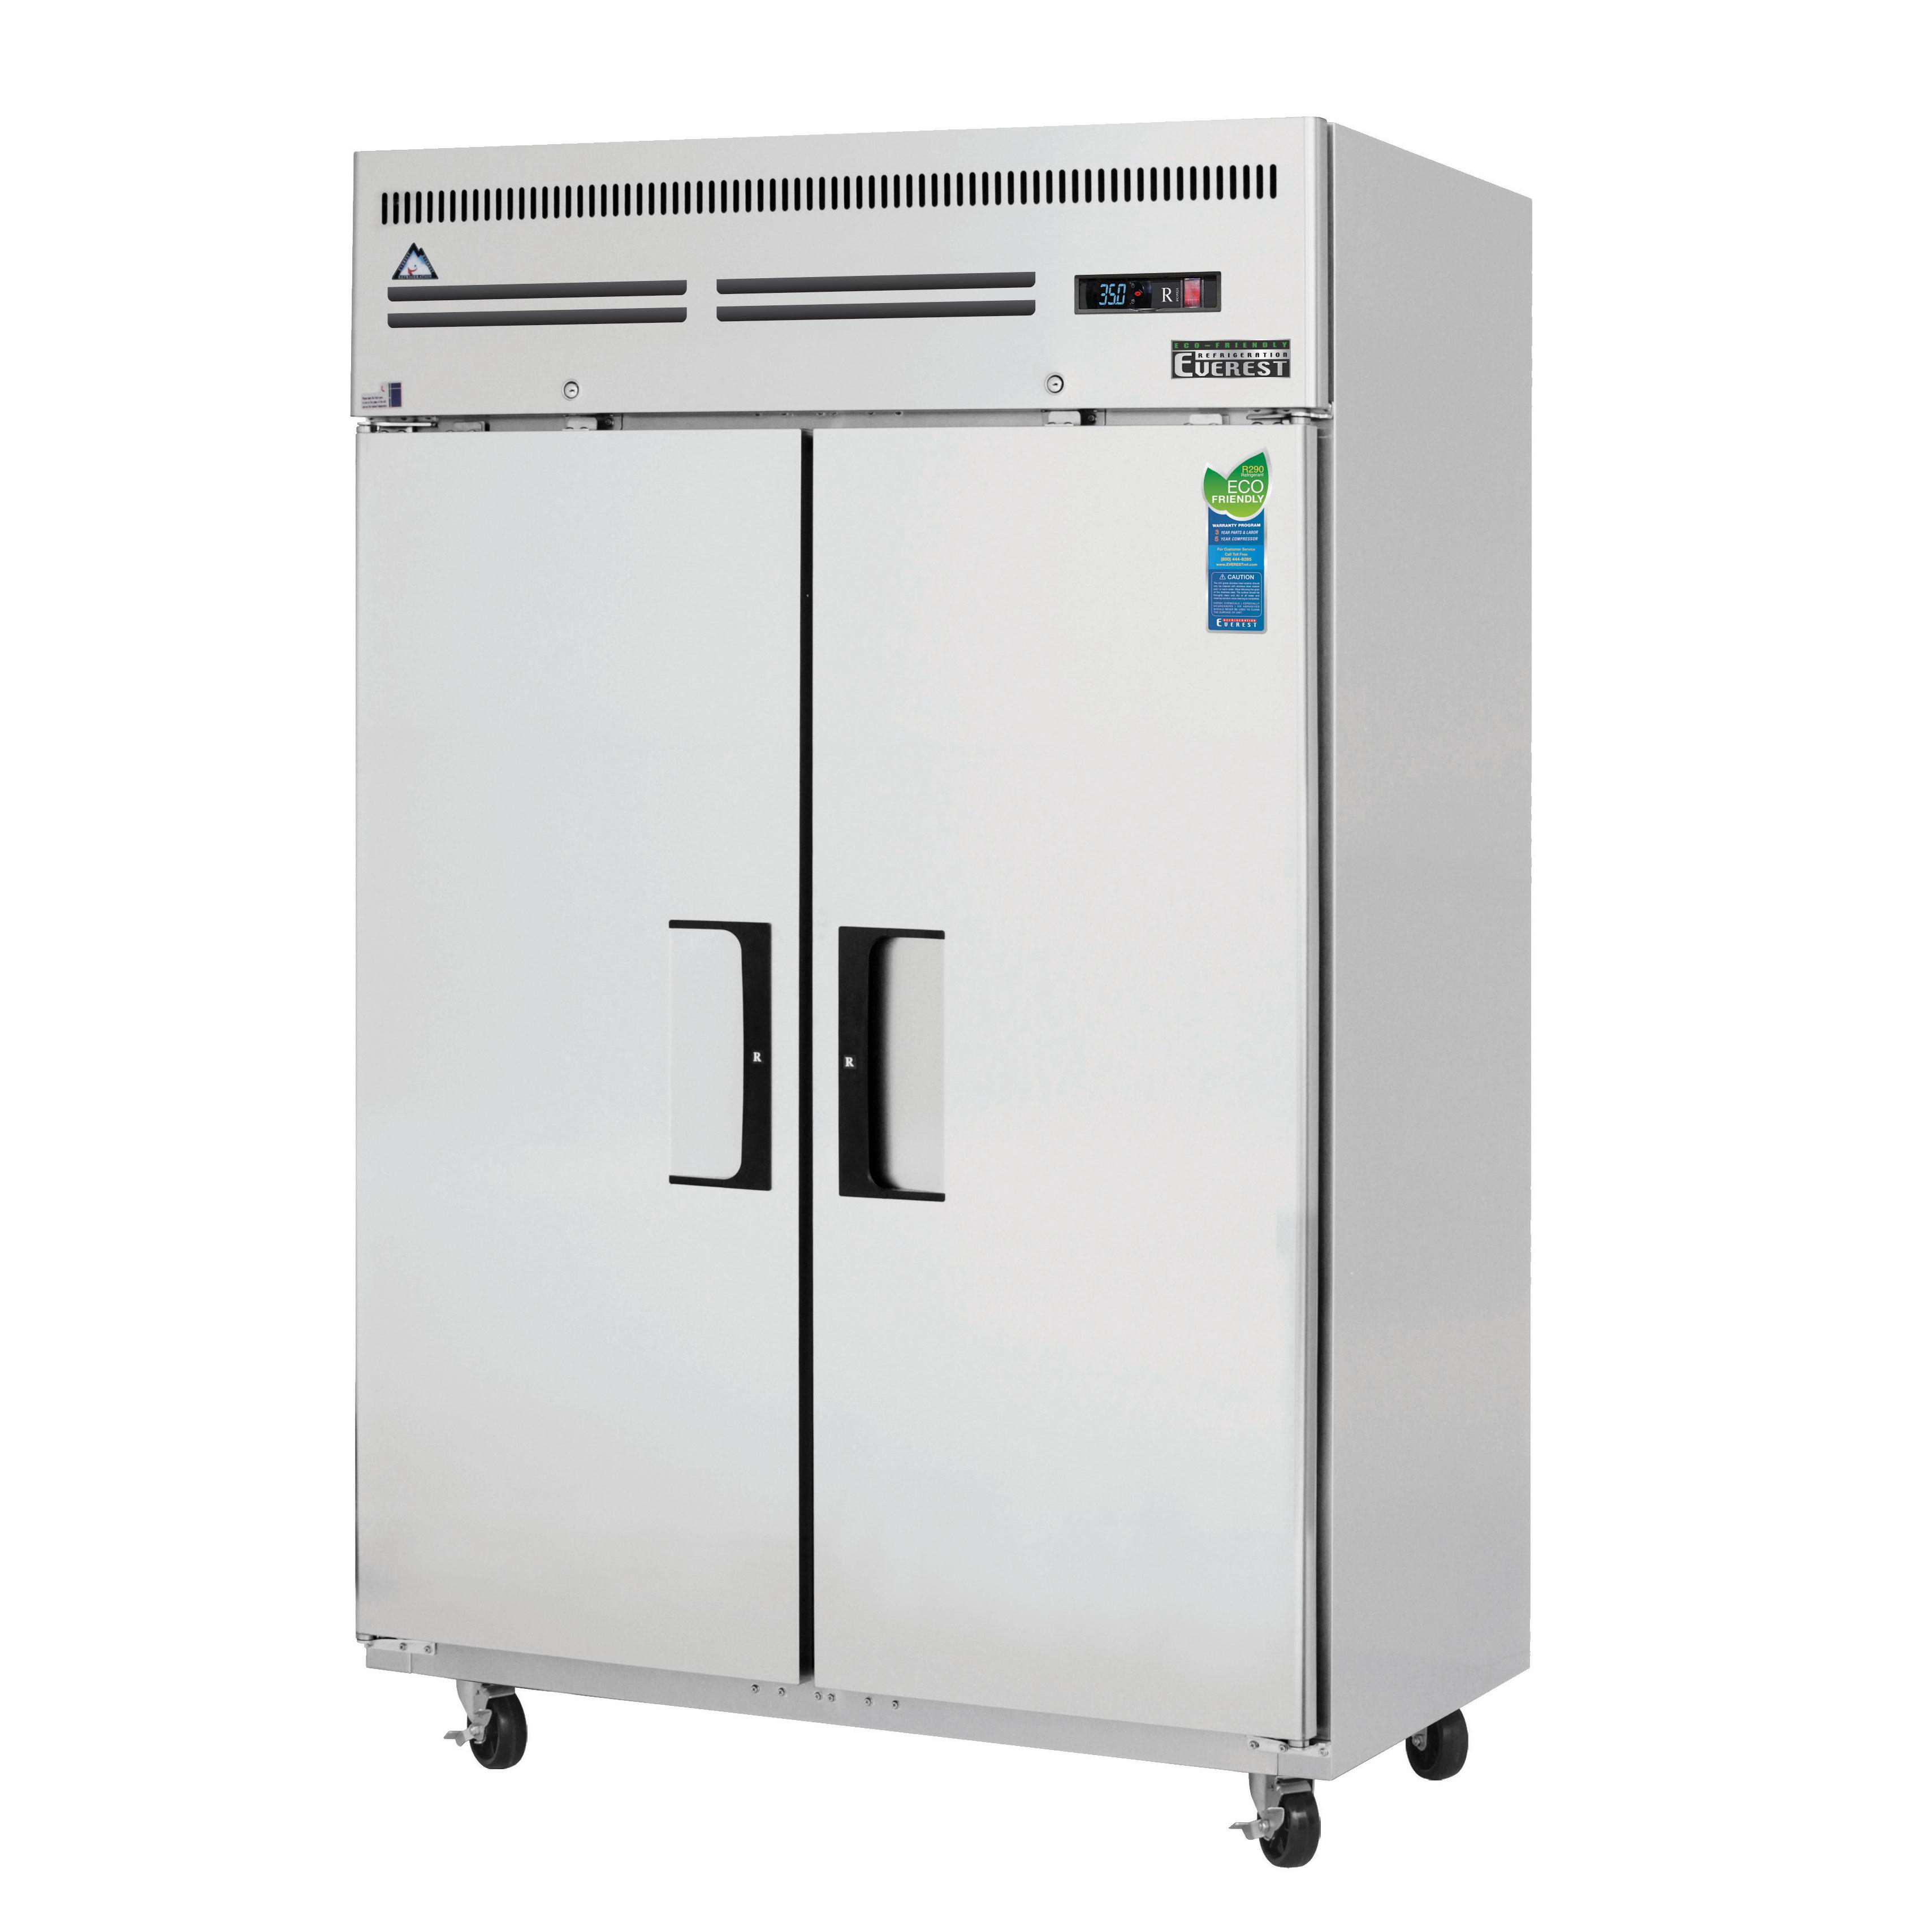 Everest Refrigeration ESR2 refrigerator, reach-in